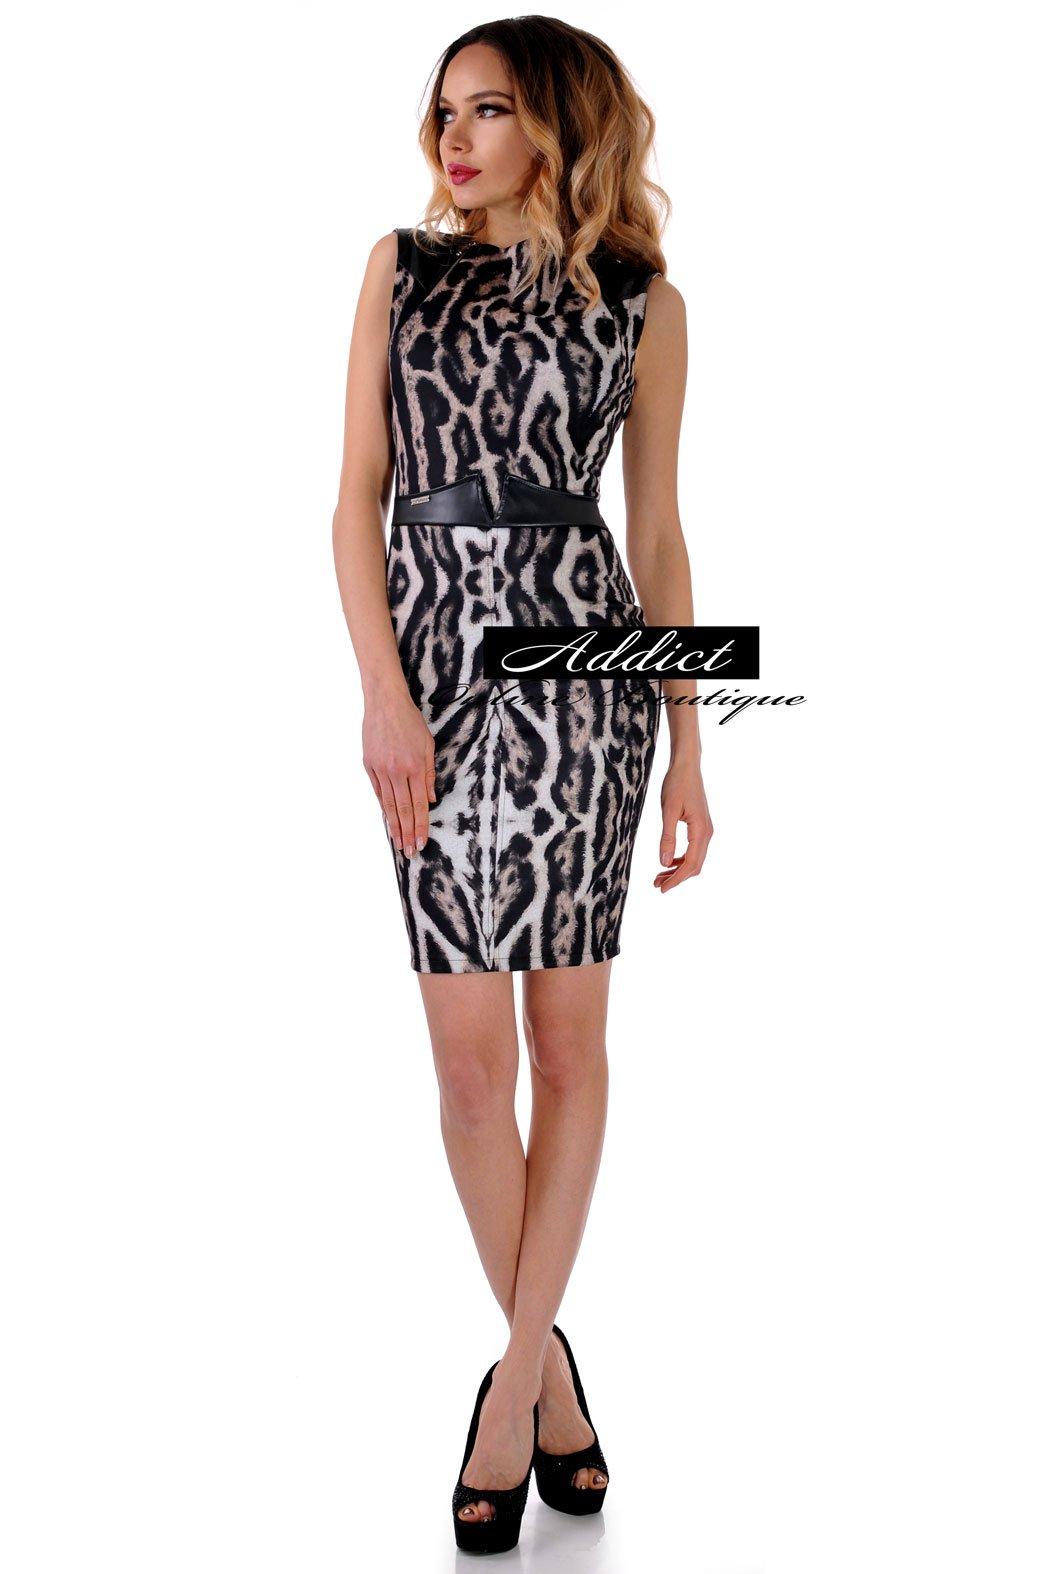 рокля от леопардова метерия българска бг адикт